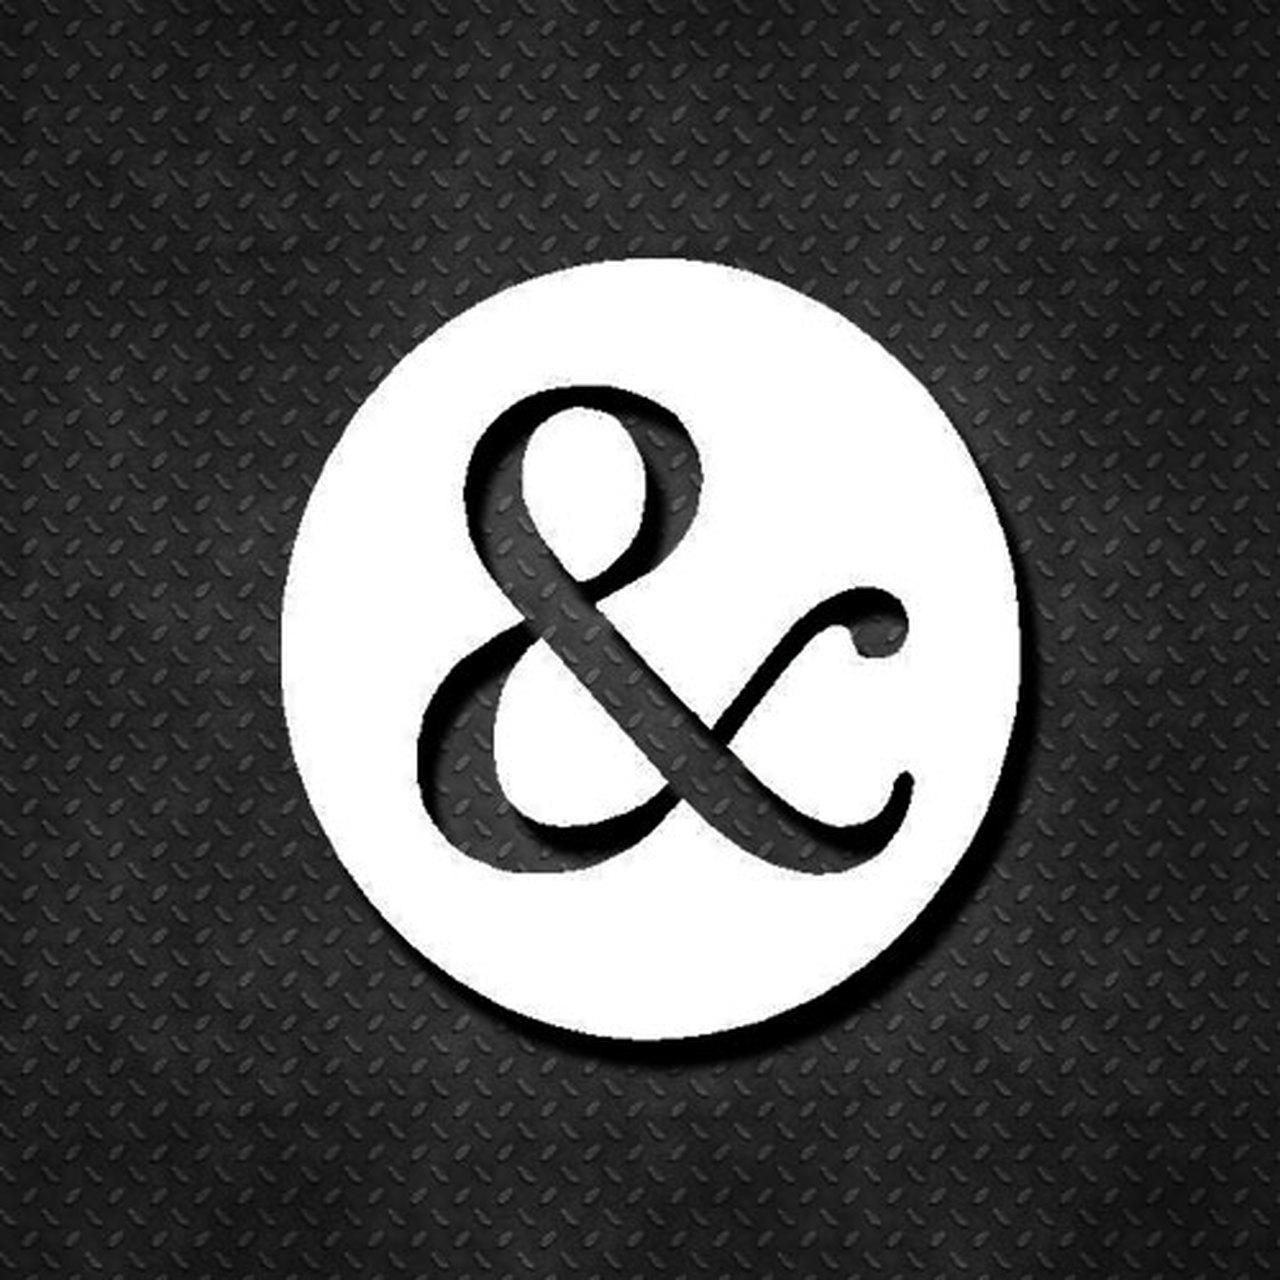 Of Mice and Men Logo Vinyl Decal Sticker.